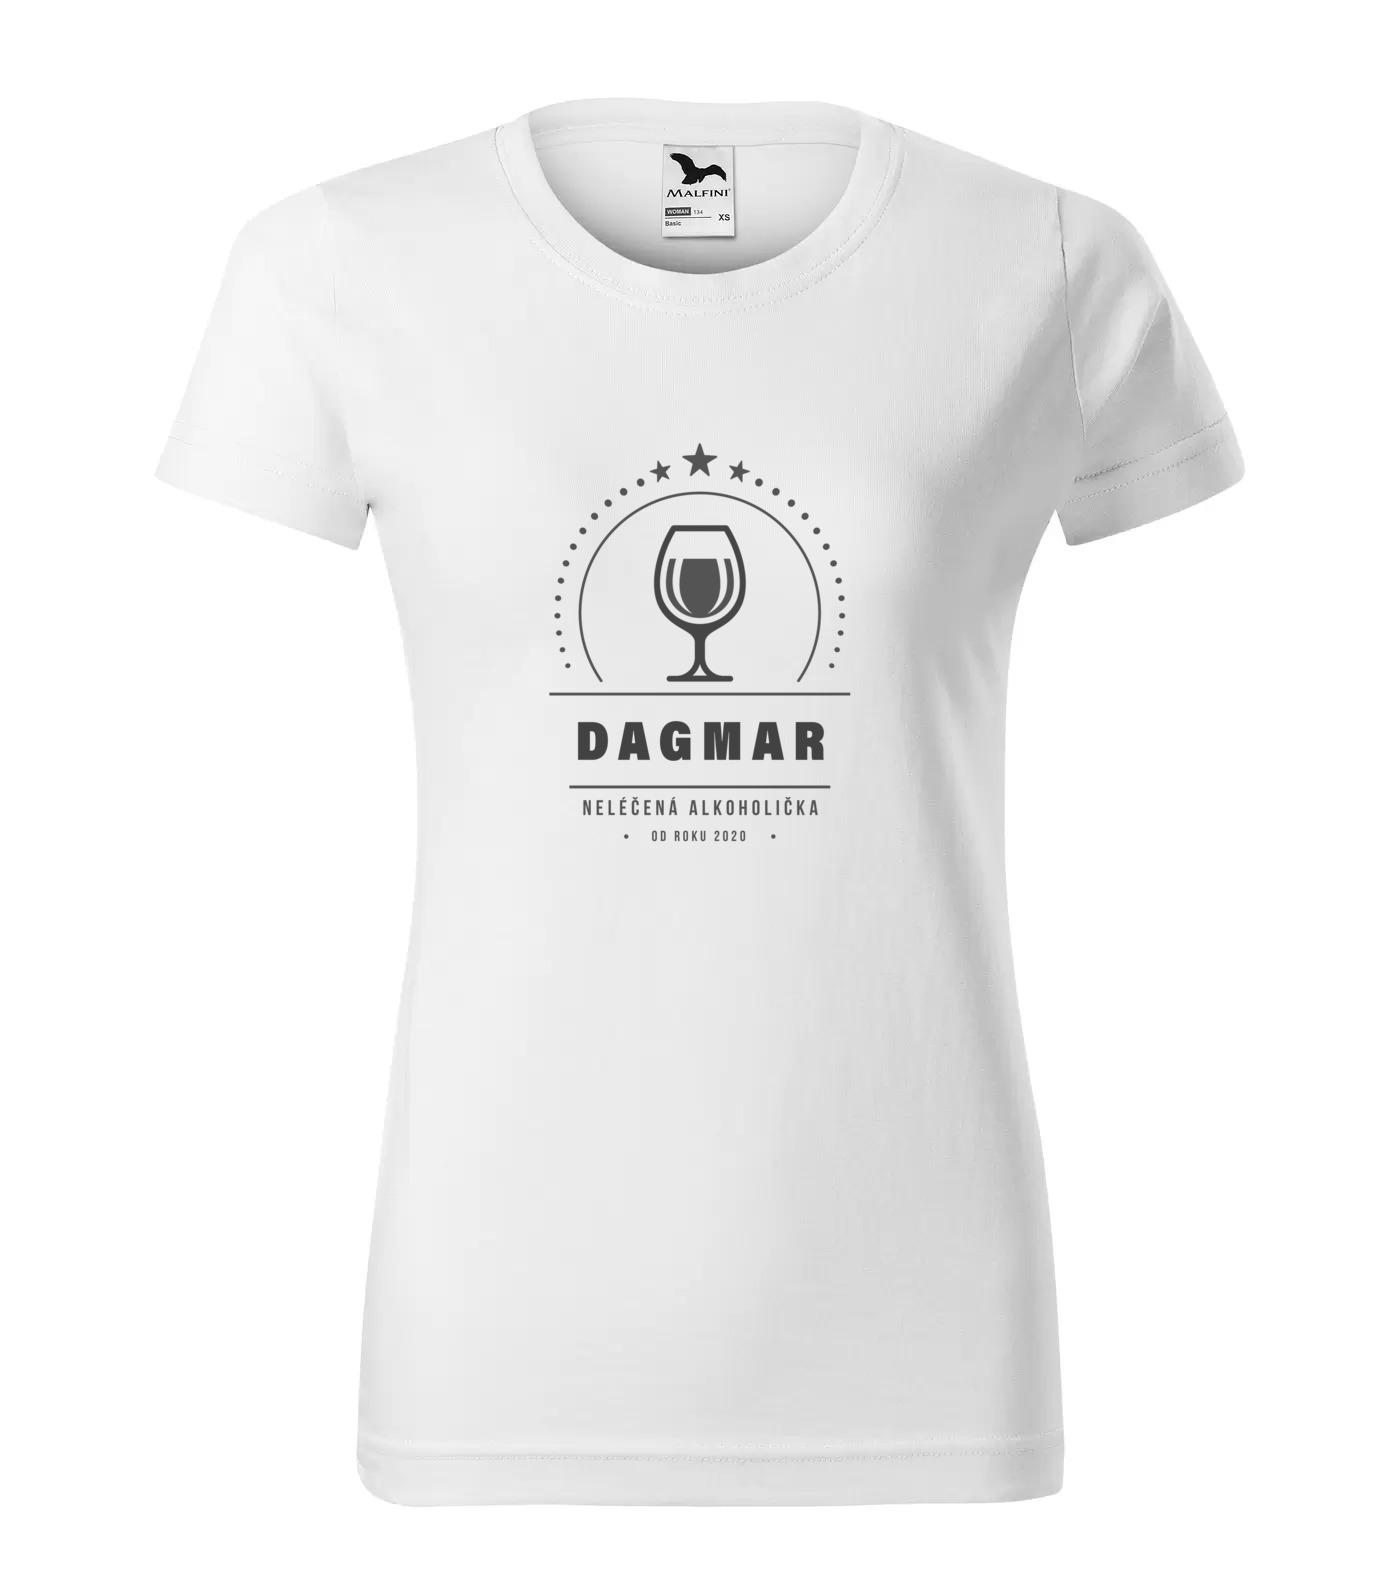 Tričko Alkoholička Dagmar